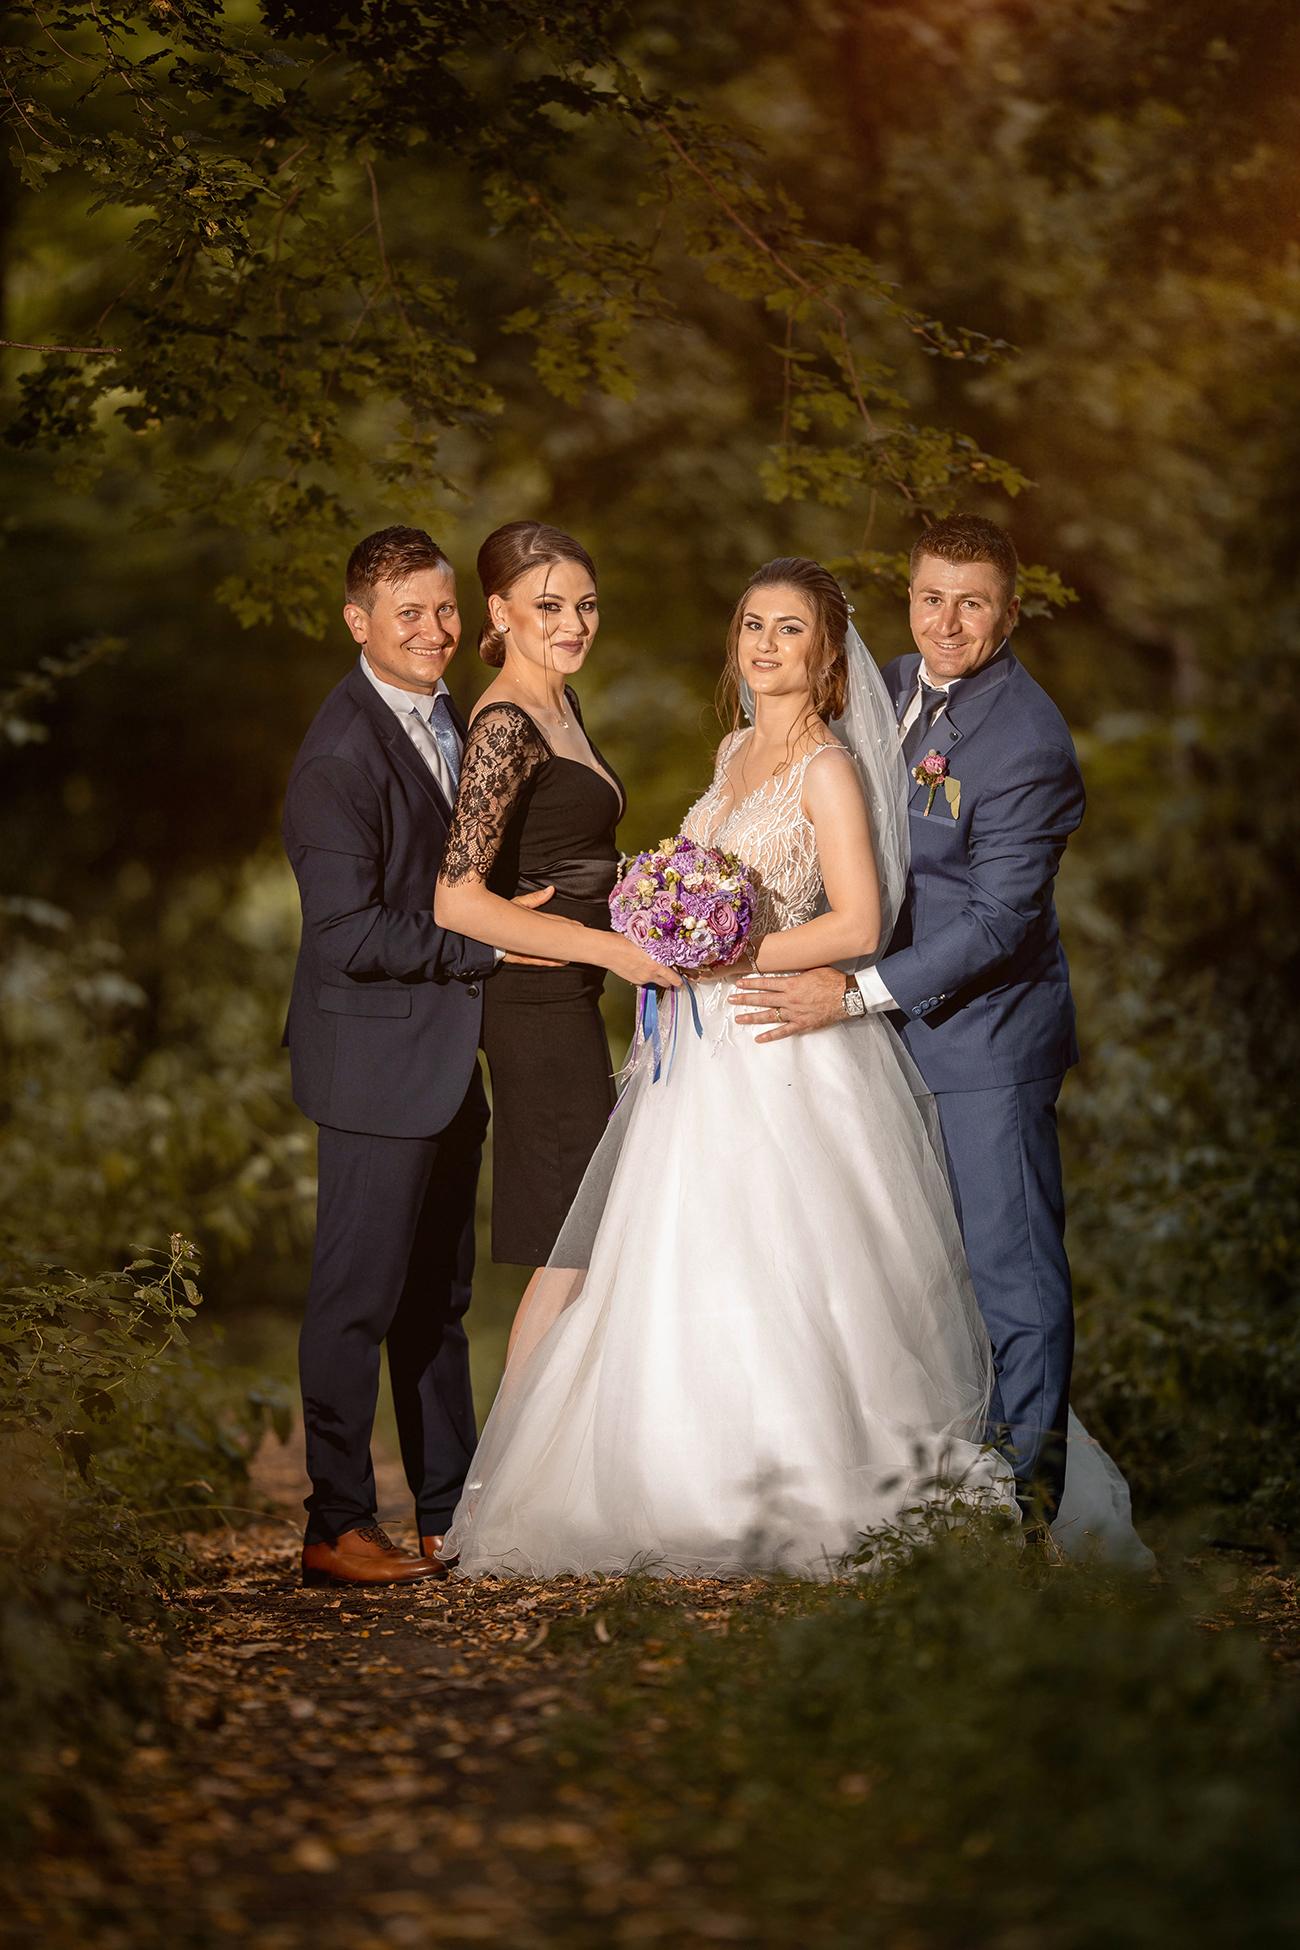 fotograf nunta iasi 048 1